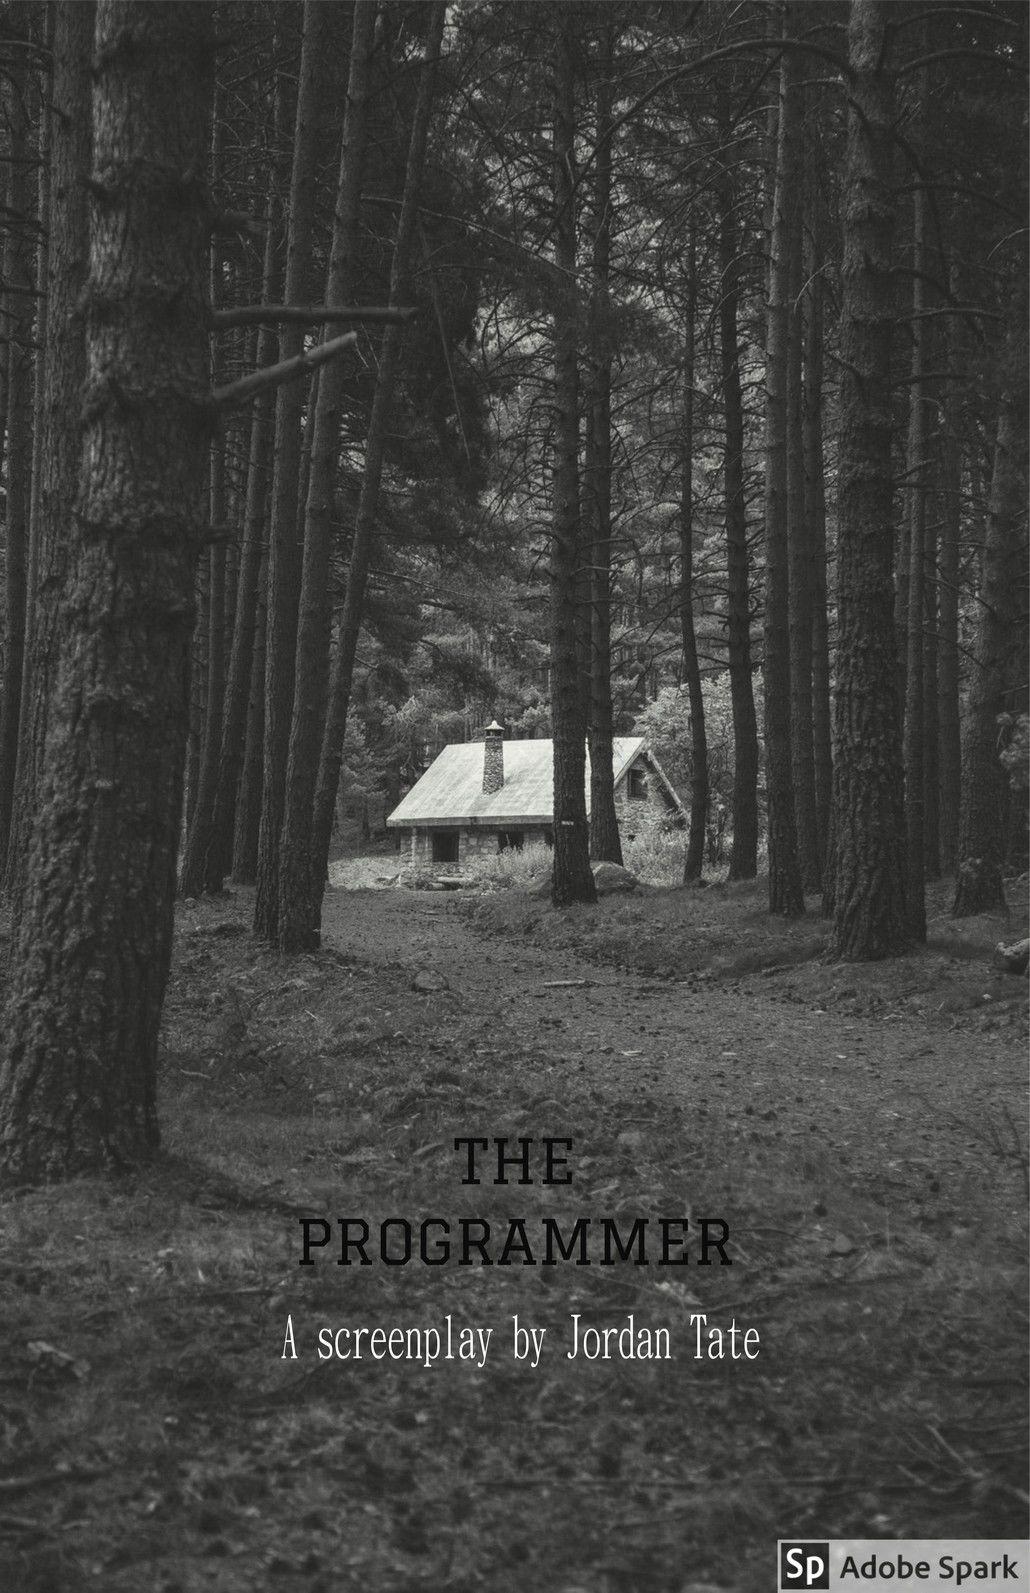 THE PROGRAMMER